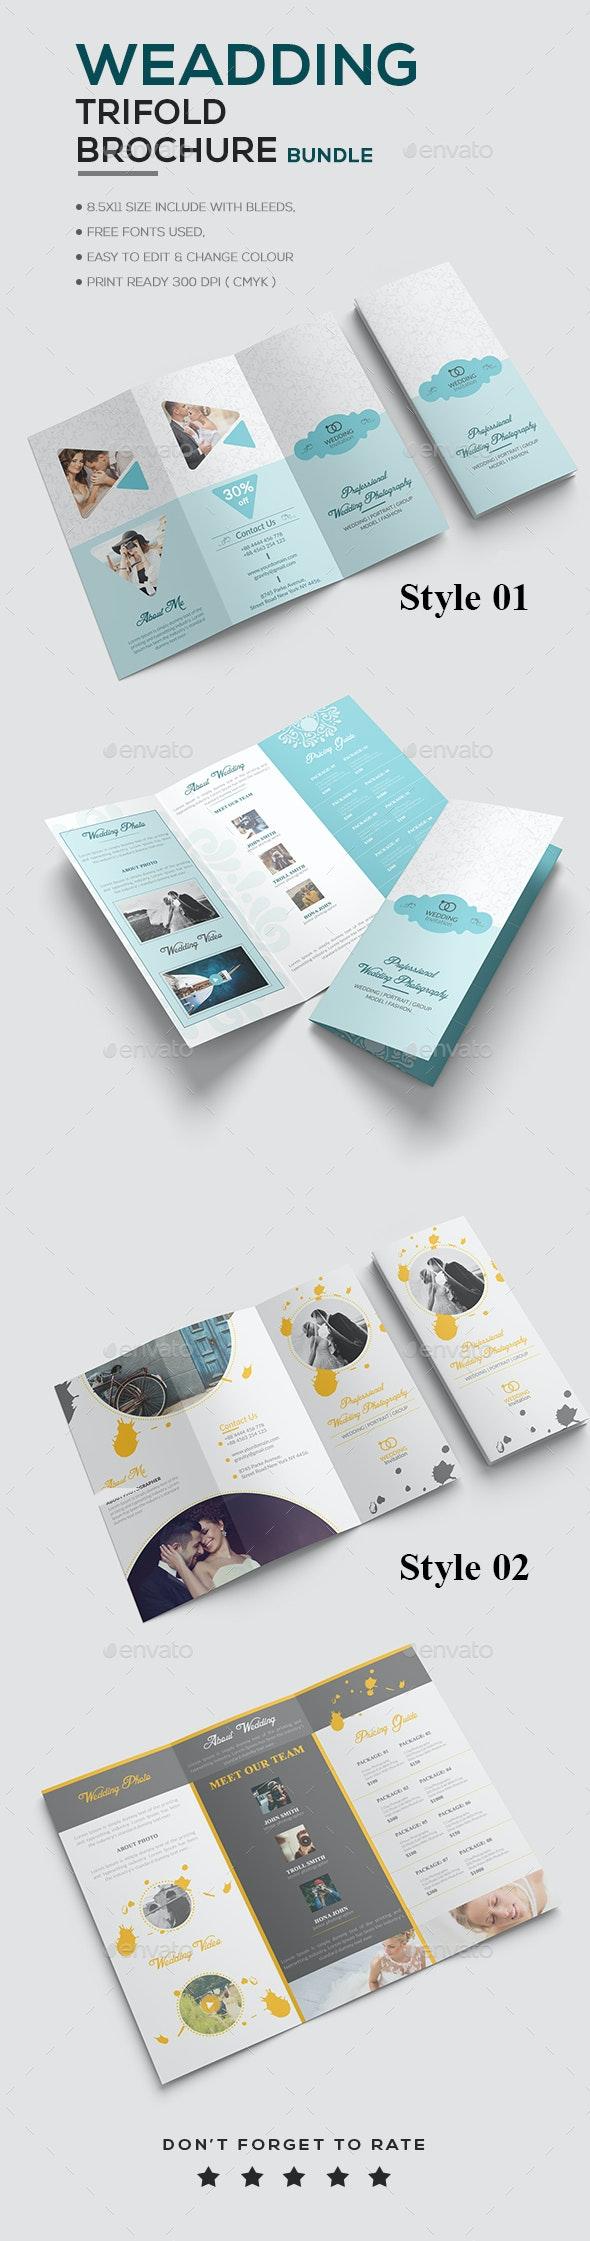 Wedding Brochure Bundle - Brochures Print Templates